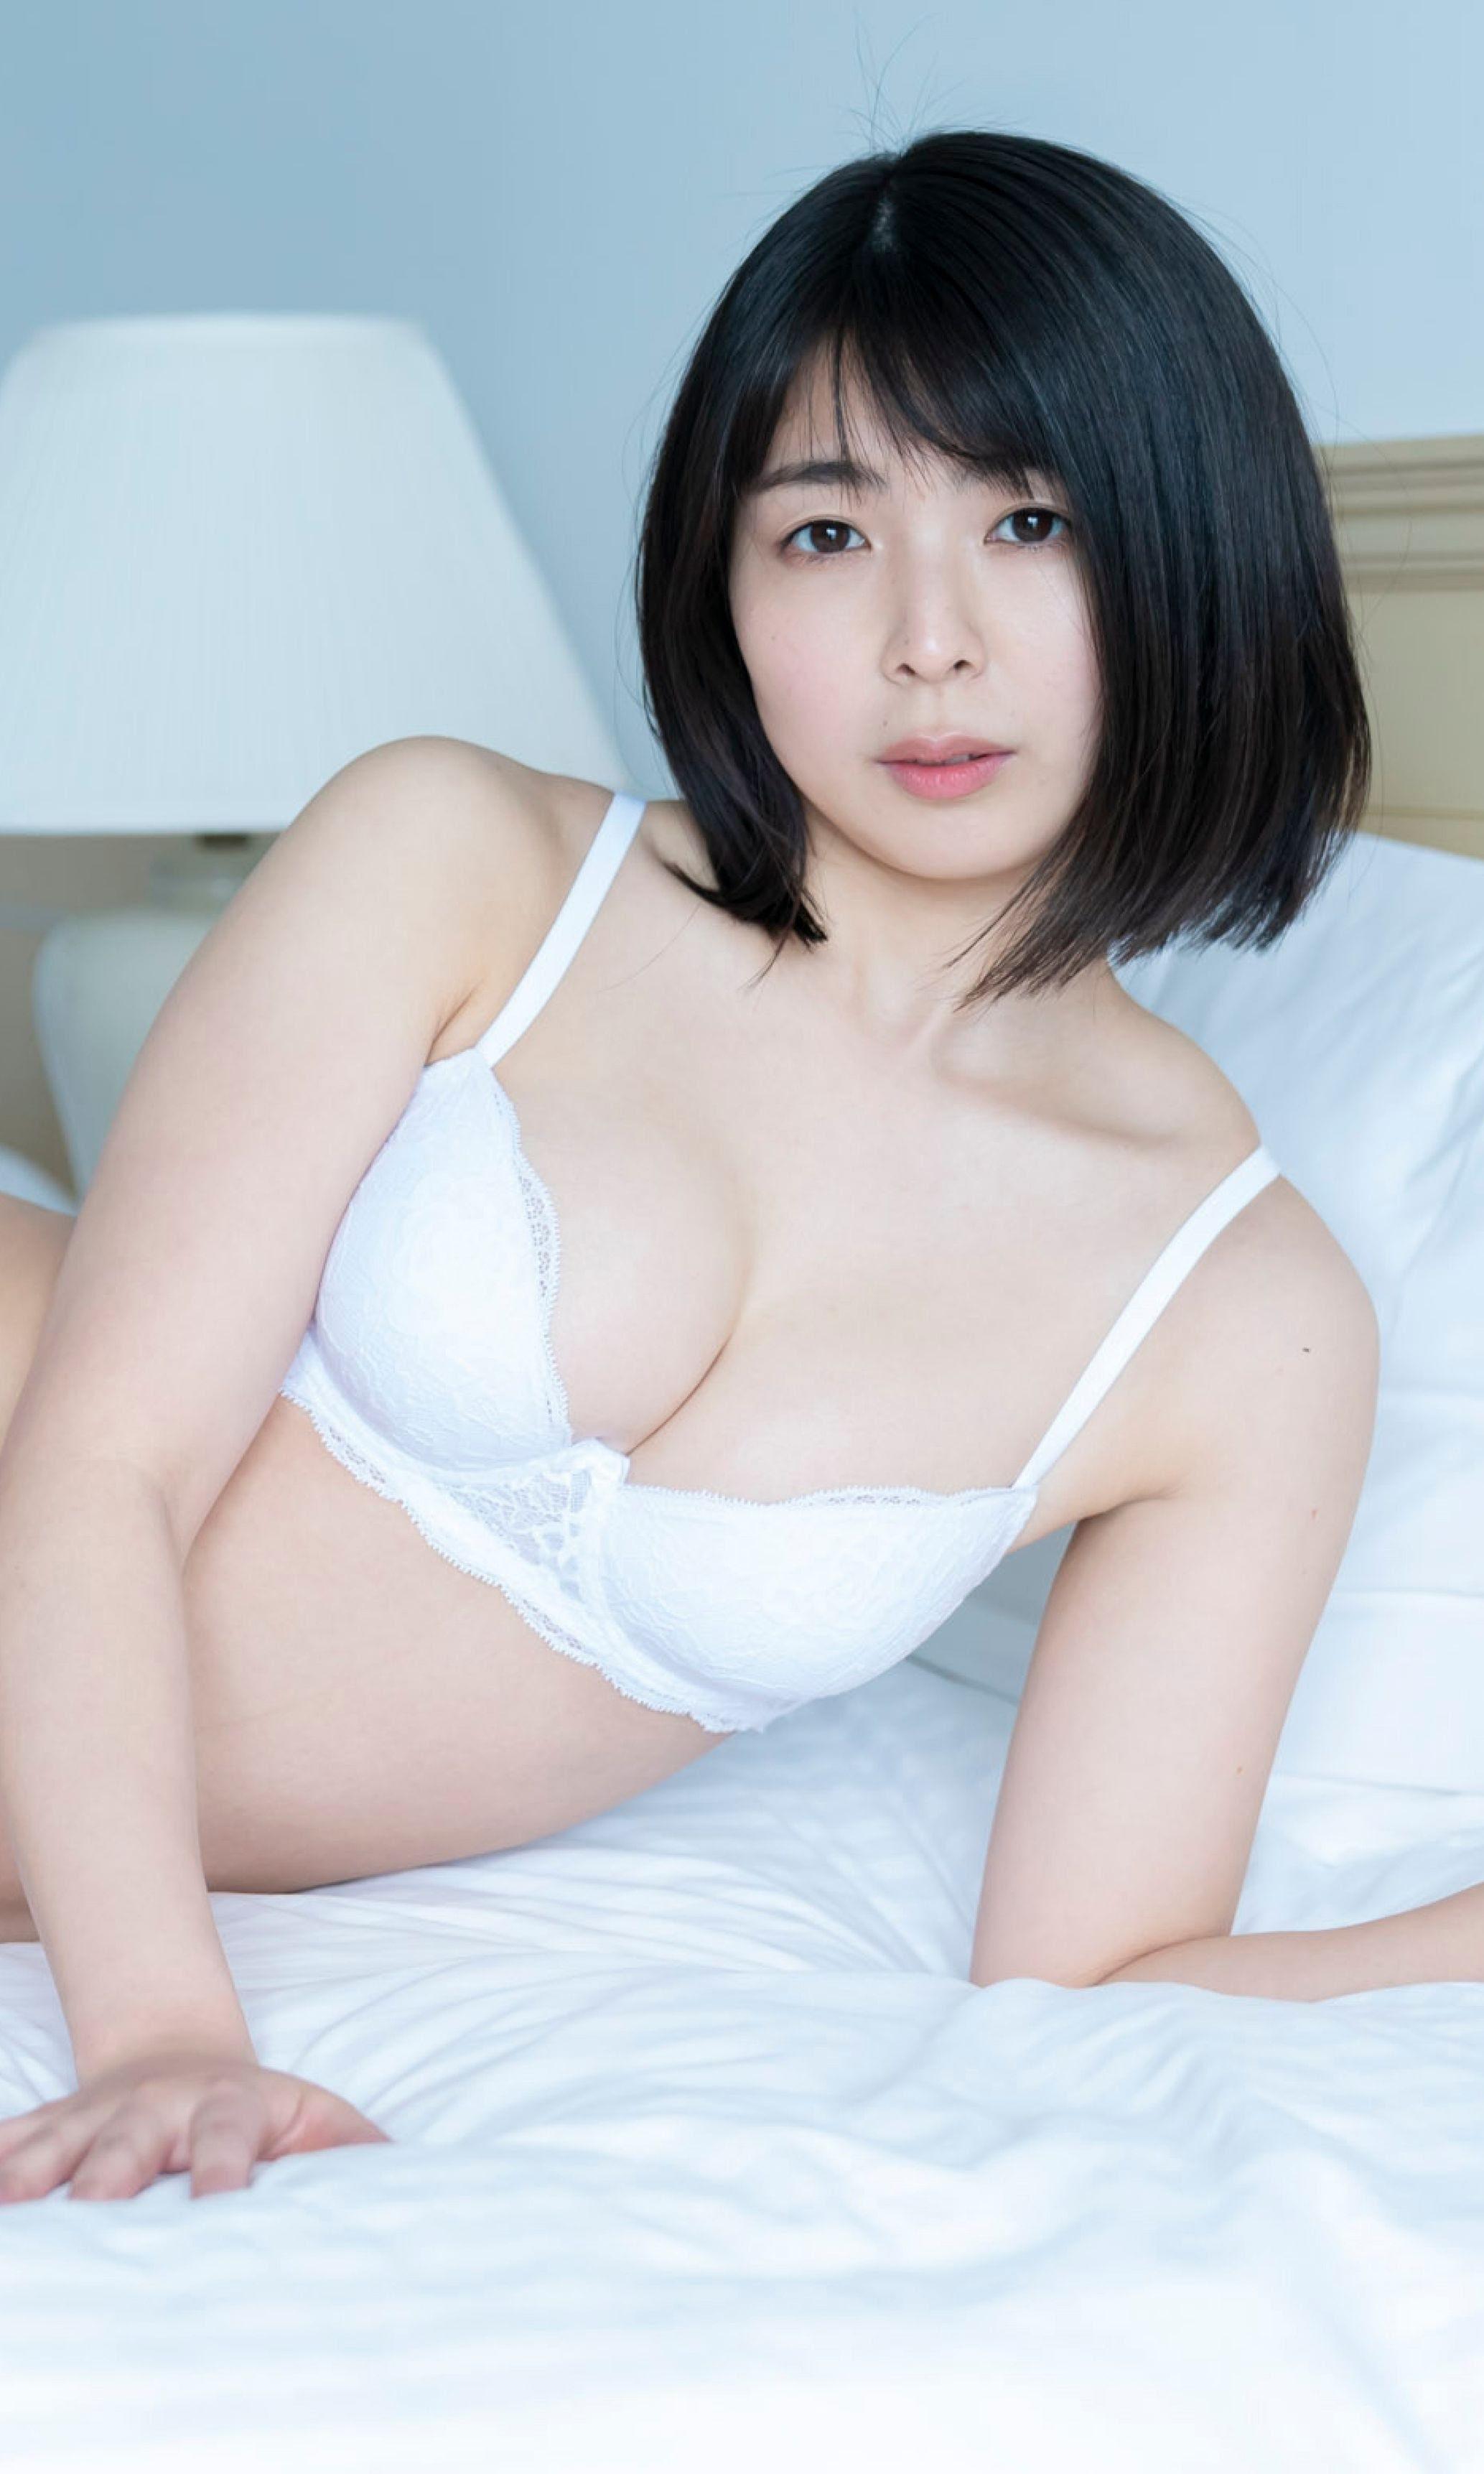 小山璃奈 頓知気さきな 伊藤美来-Weekly Playboy 2021年第十八期 高清套图 第75张